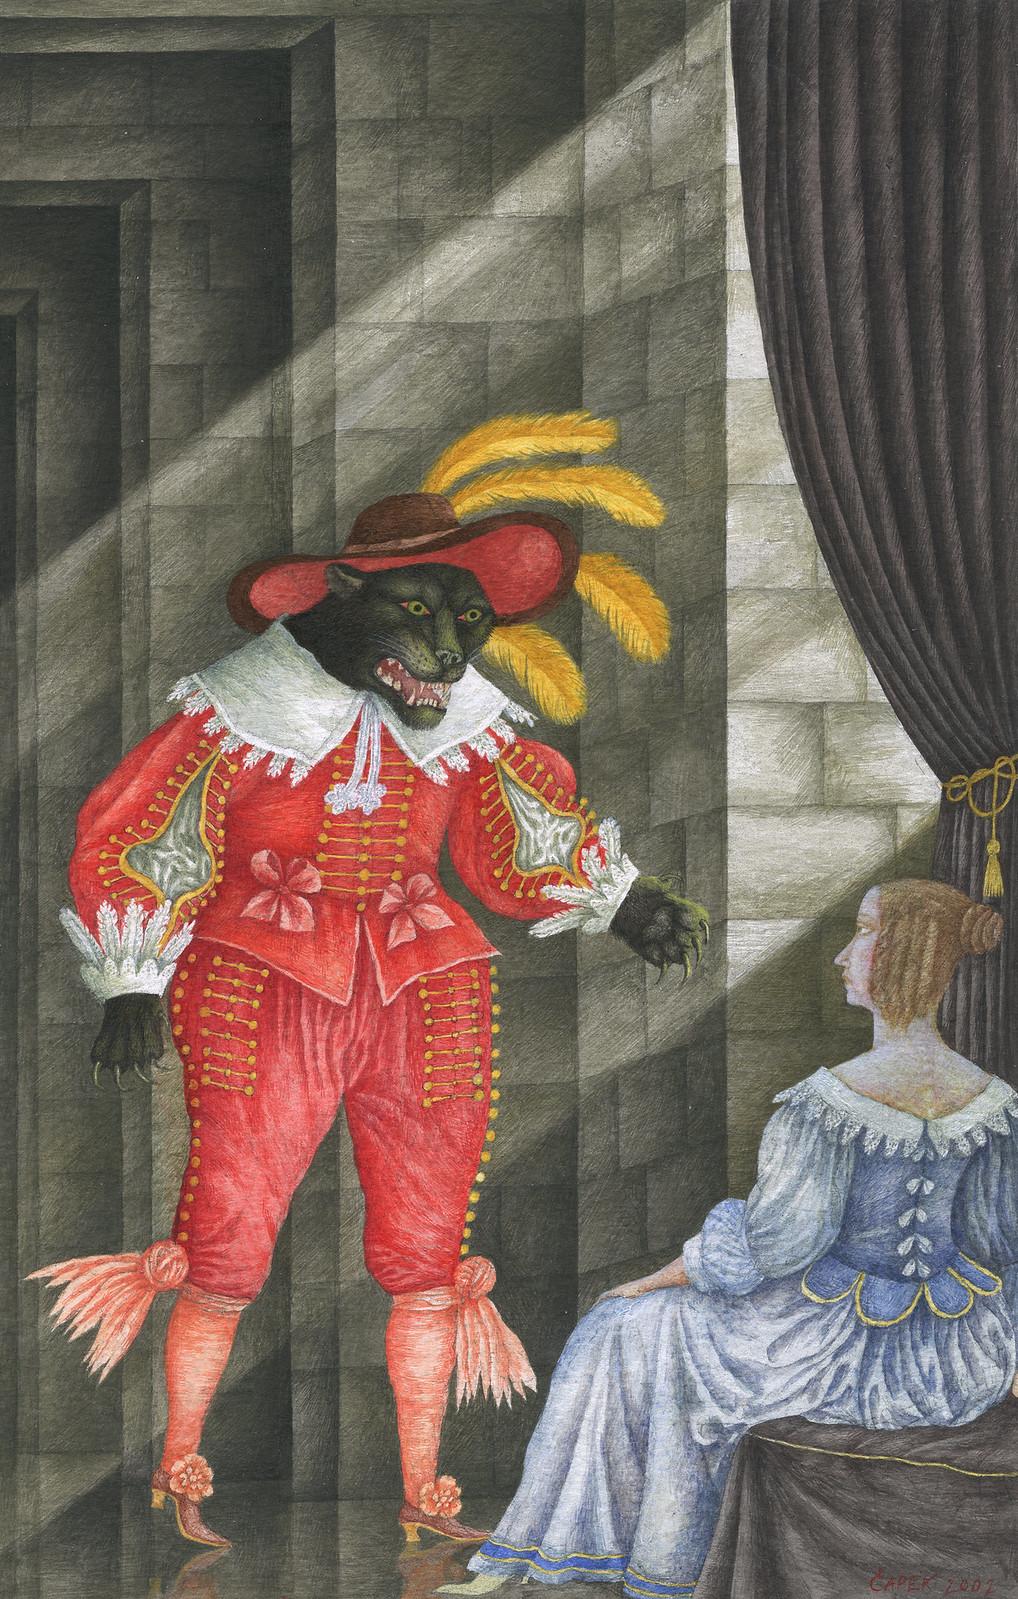 Jindra Capek - Fairy Tales of the World, Illustration 2